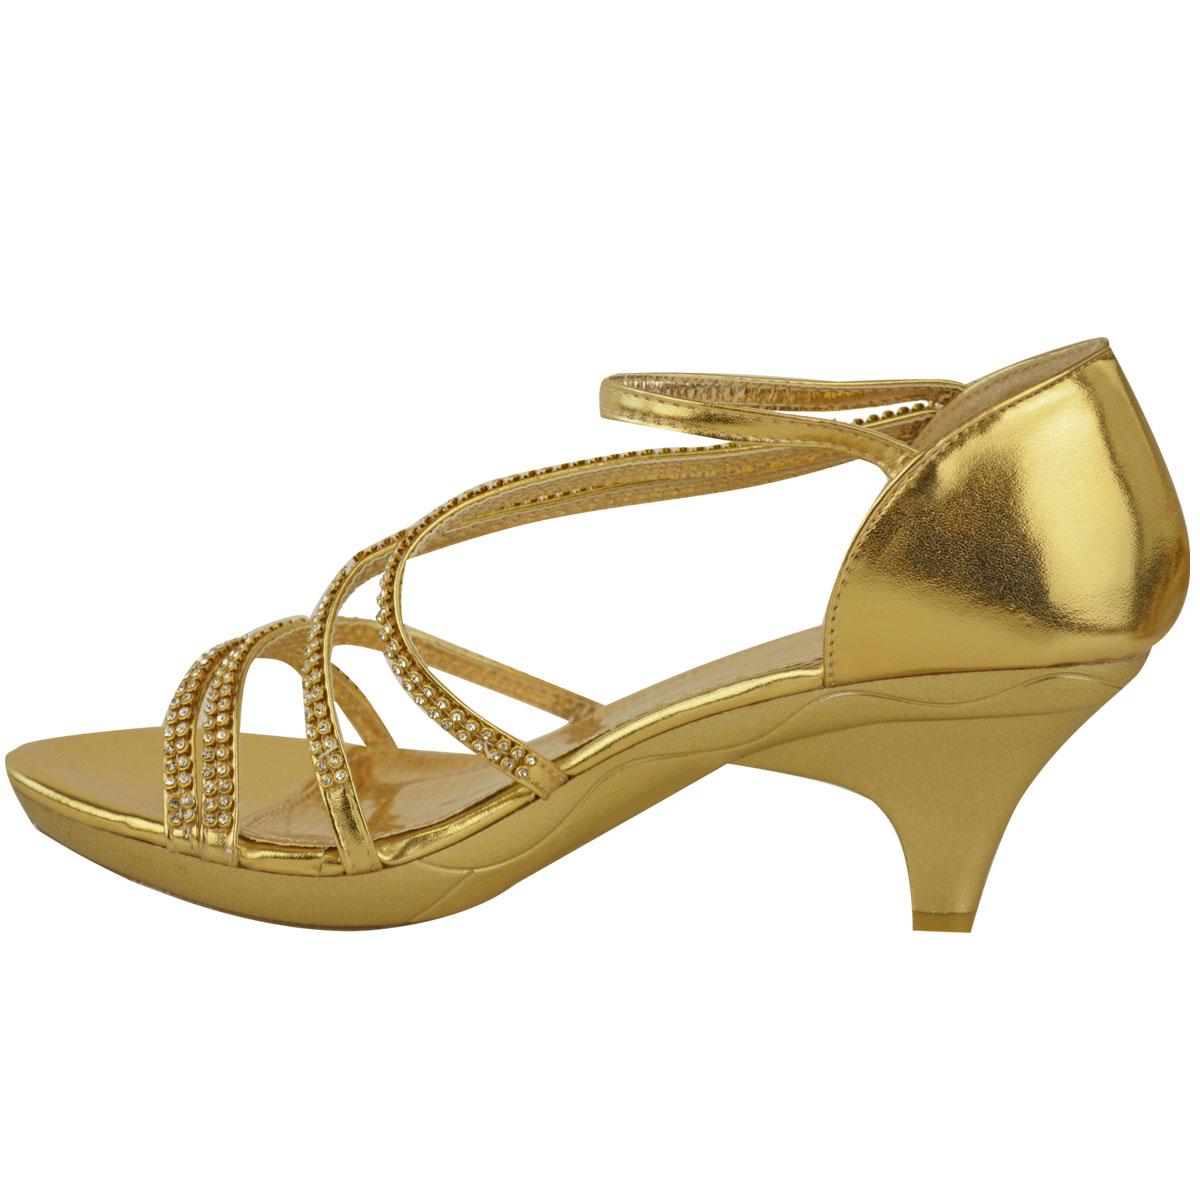 New Womens Ladies Girls Low Heel Bridal Wedding Sandal ...